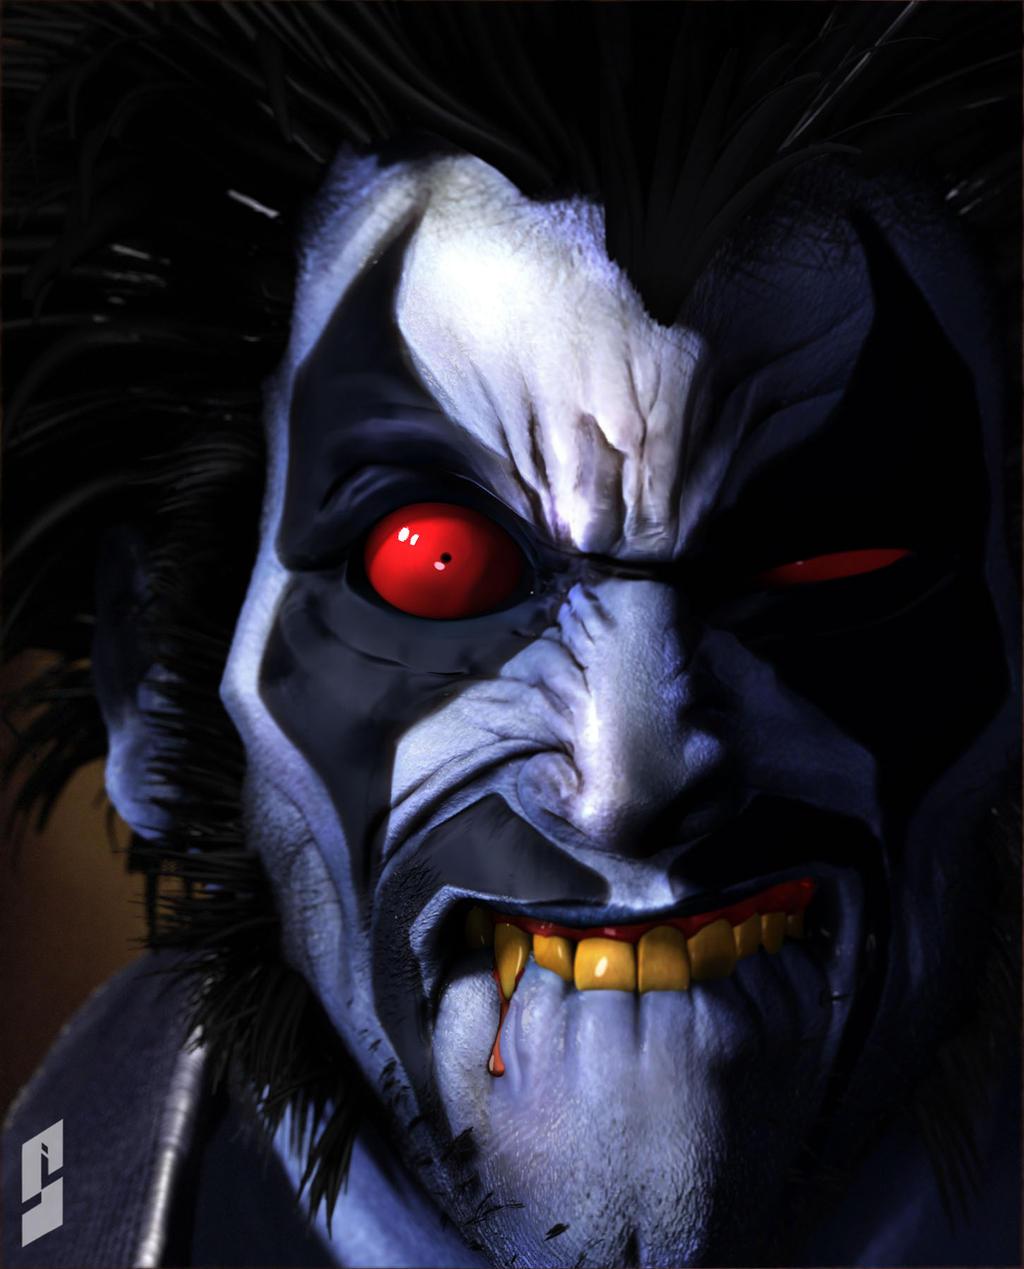 Lobo needs an image linked